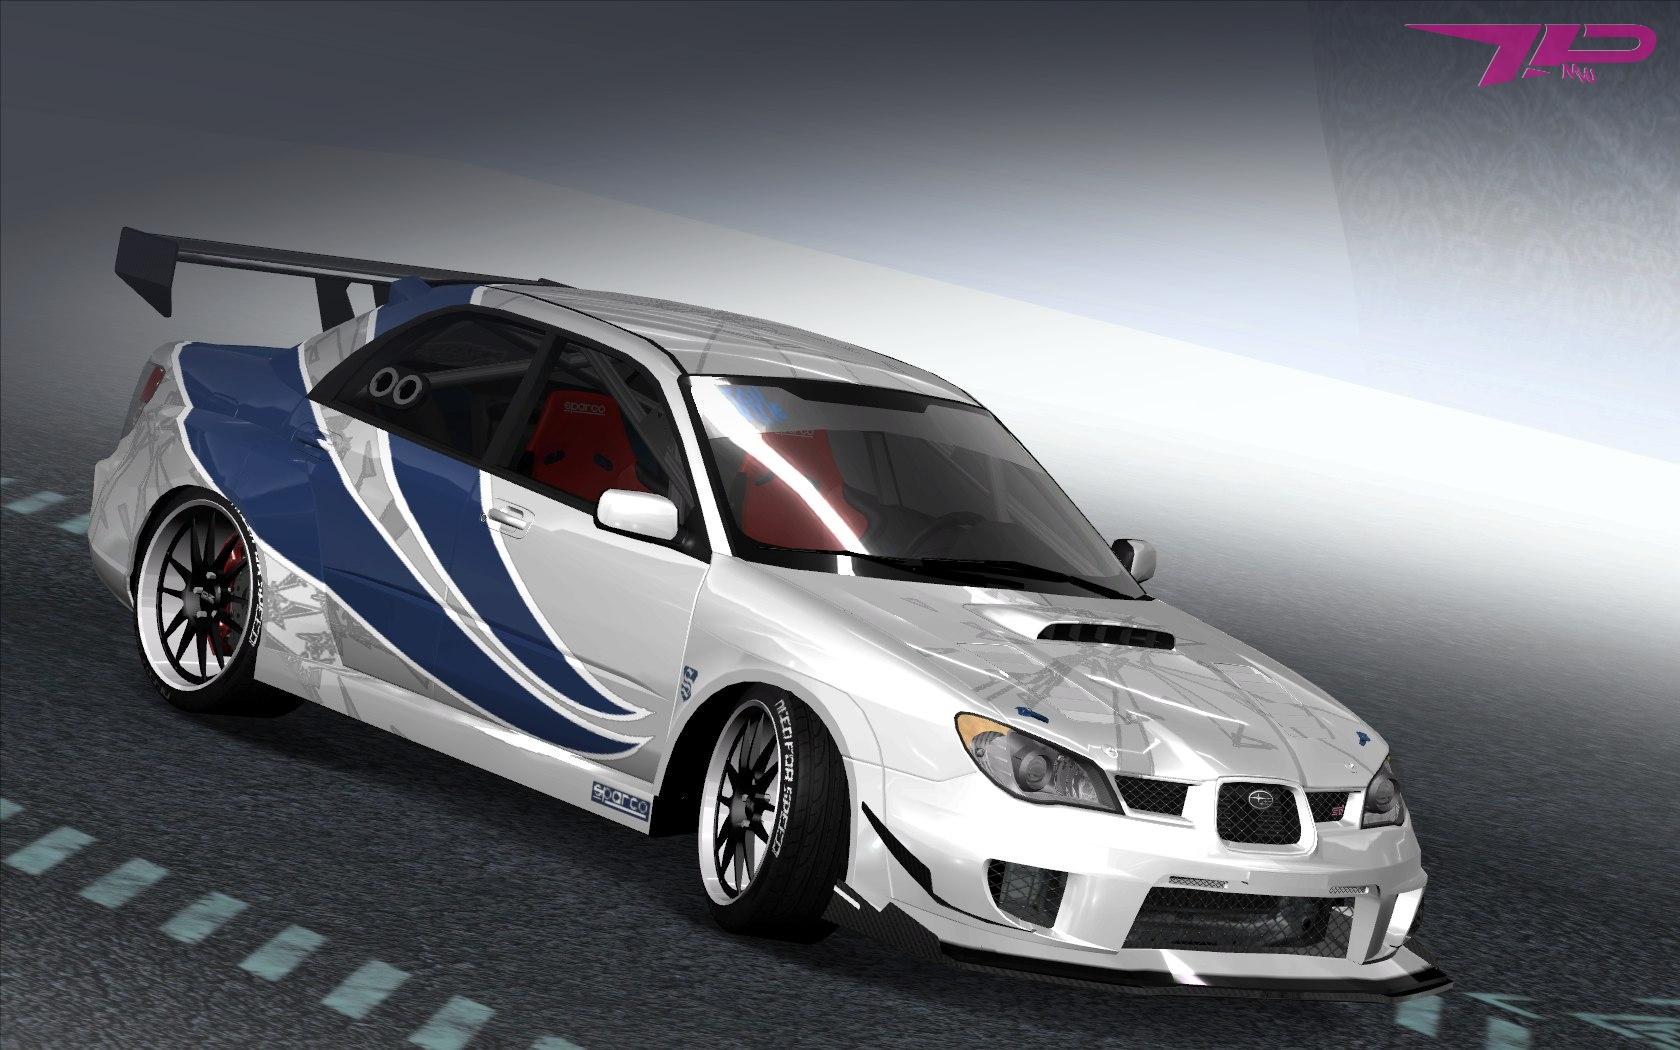 Subaru Performance Tuning >> Need For Speed Pro Street Subaru Impreza WRX STI 2006 ...